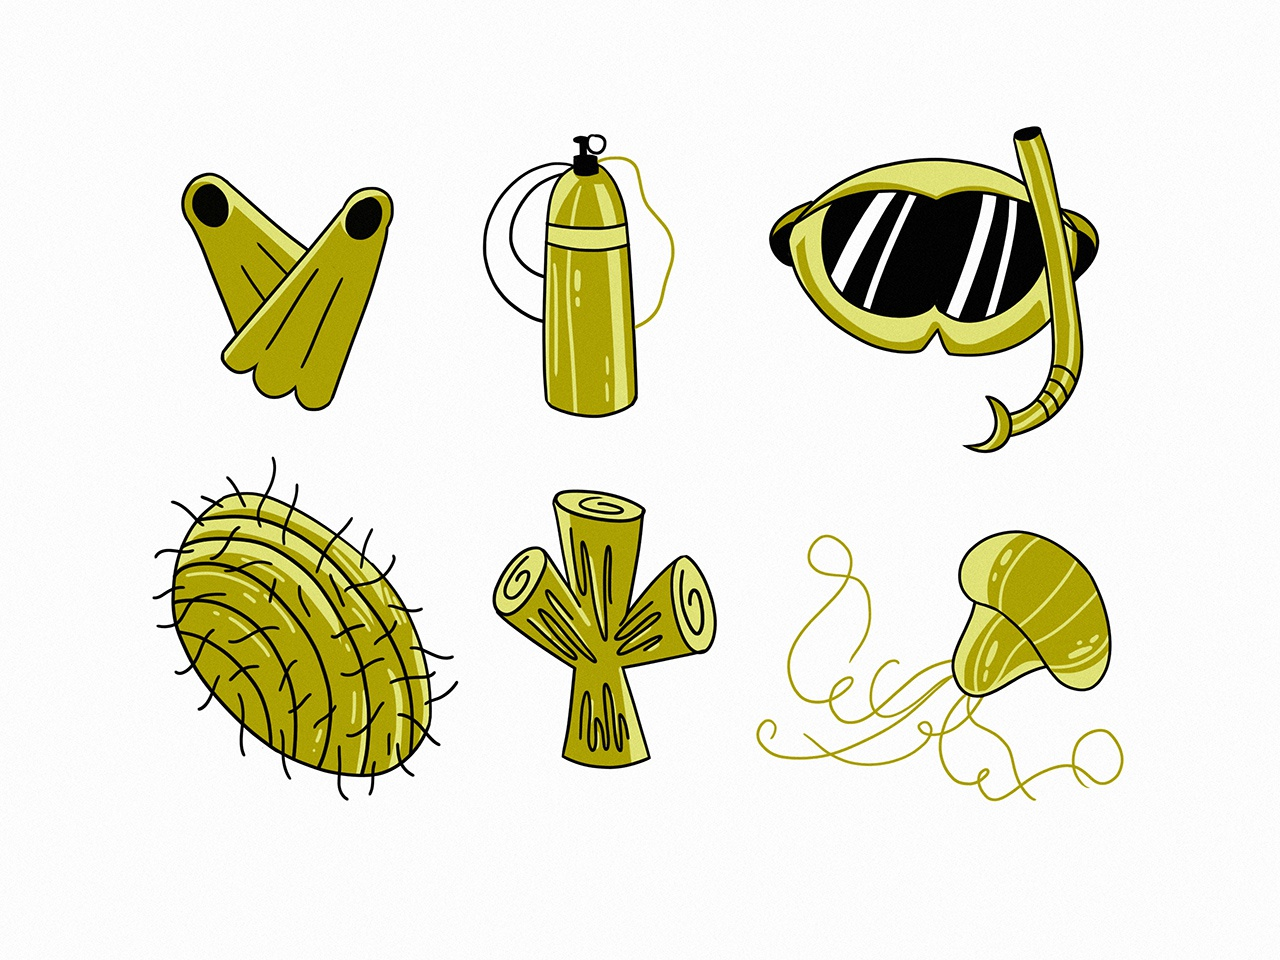 Diving icon set lineart cute objects sea creatures sealife sea food scuba diving sea icons logo design illustration